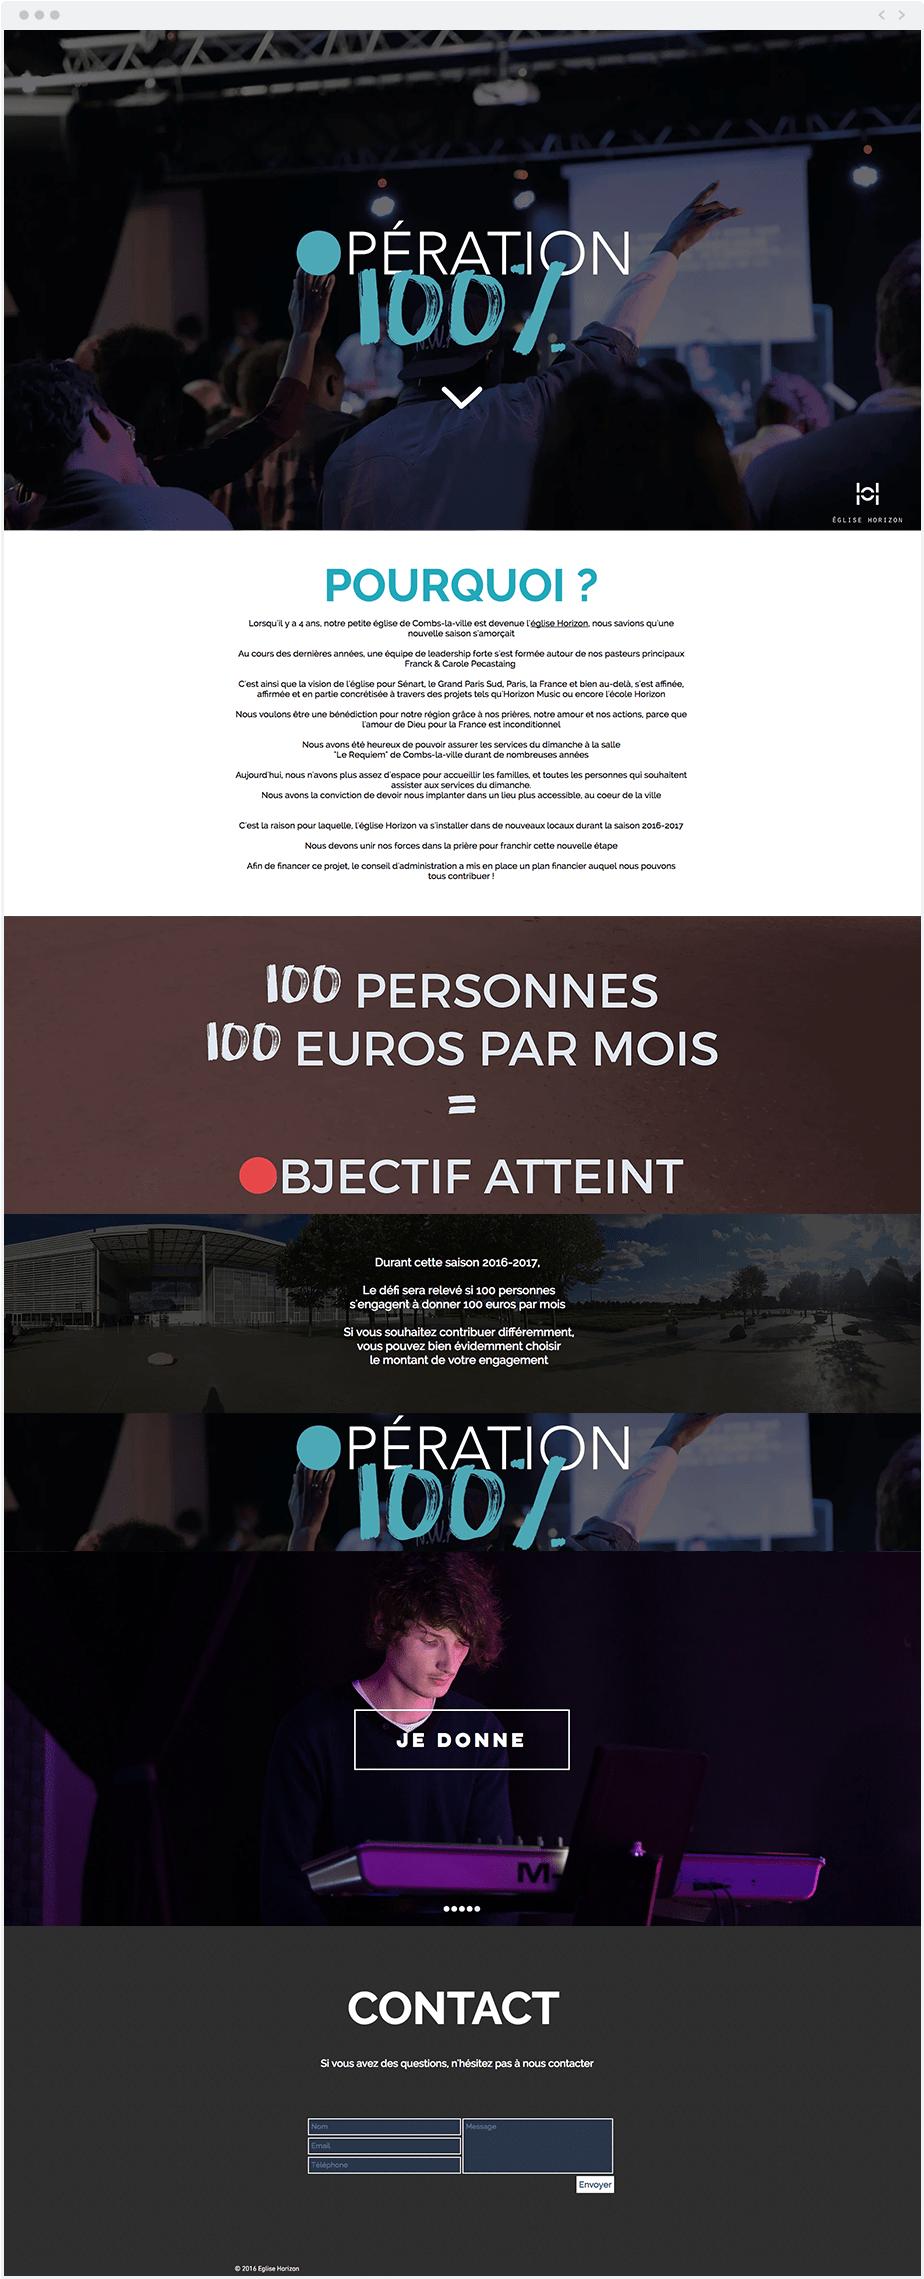 Eglise Horizon opération 100 %